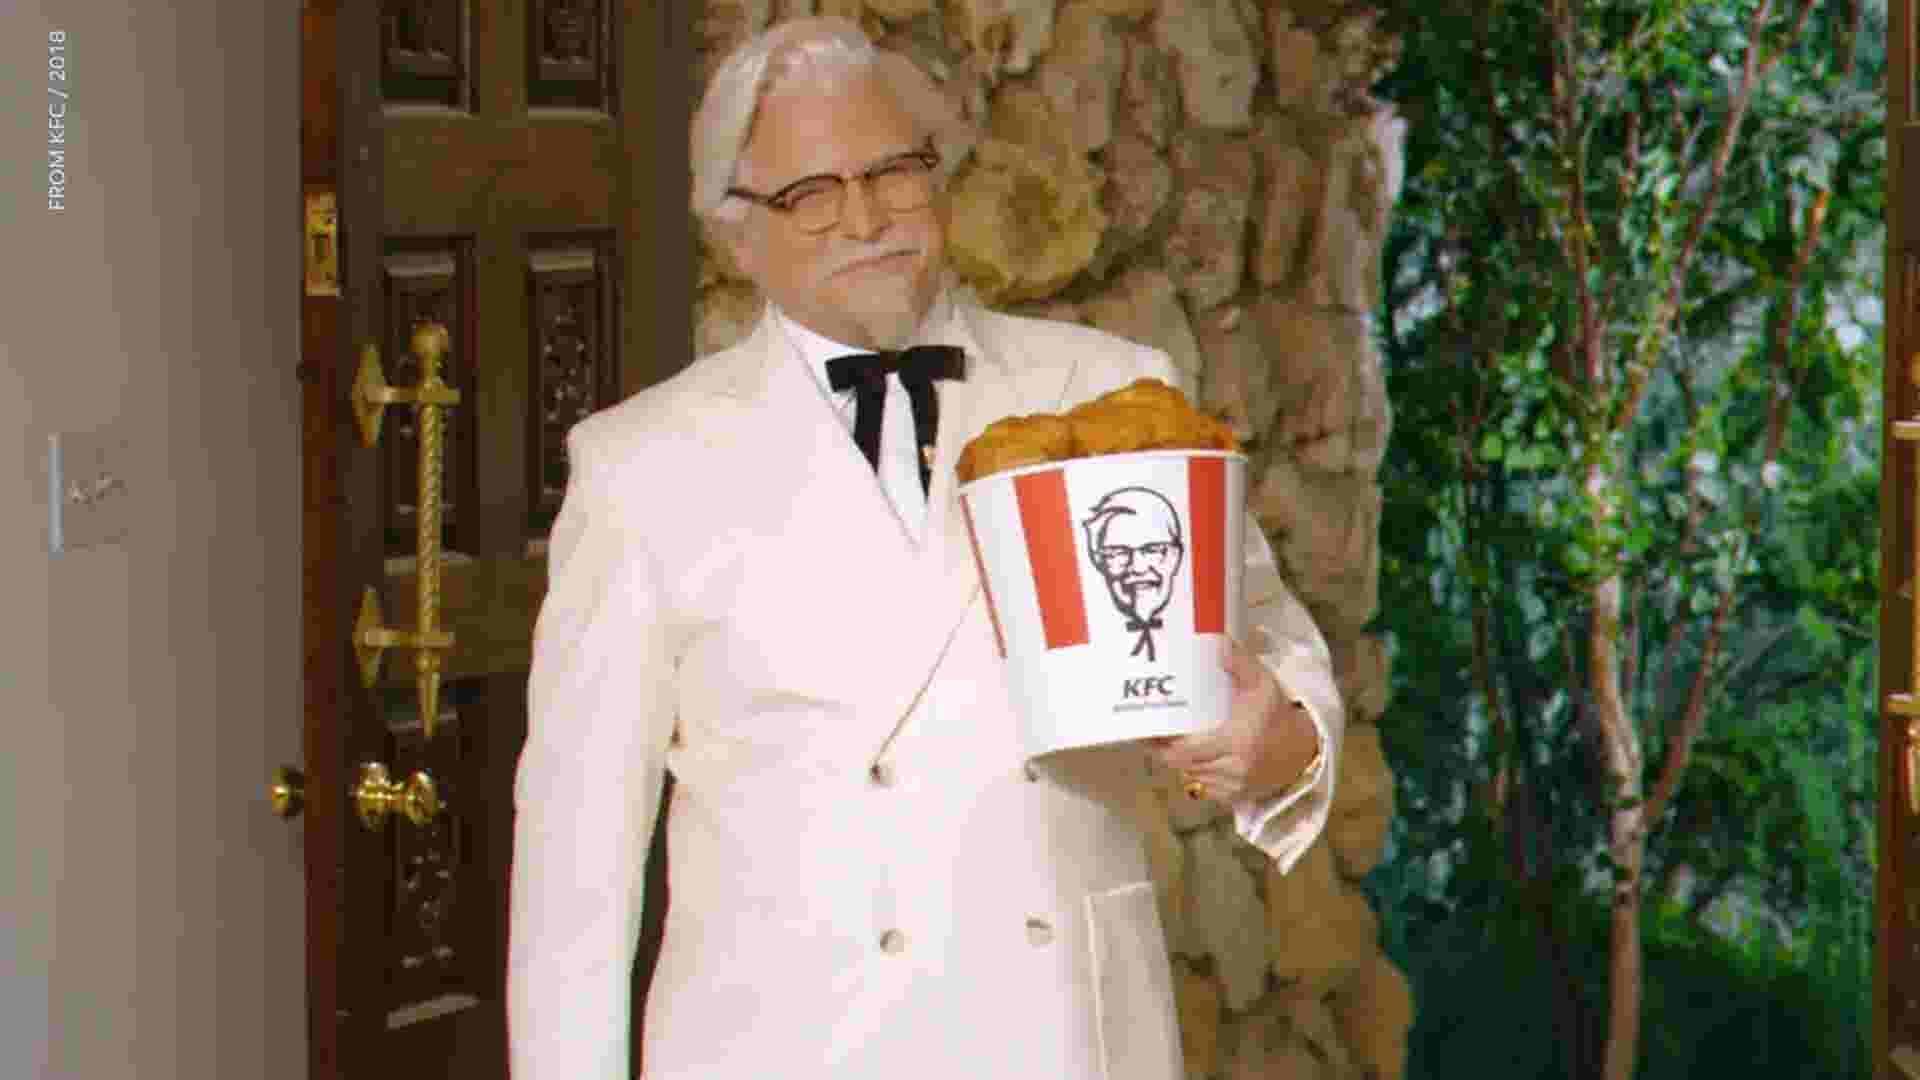 KFC taps former \'Seinfeld\' star Jason Alexander as new Colonel Sanders